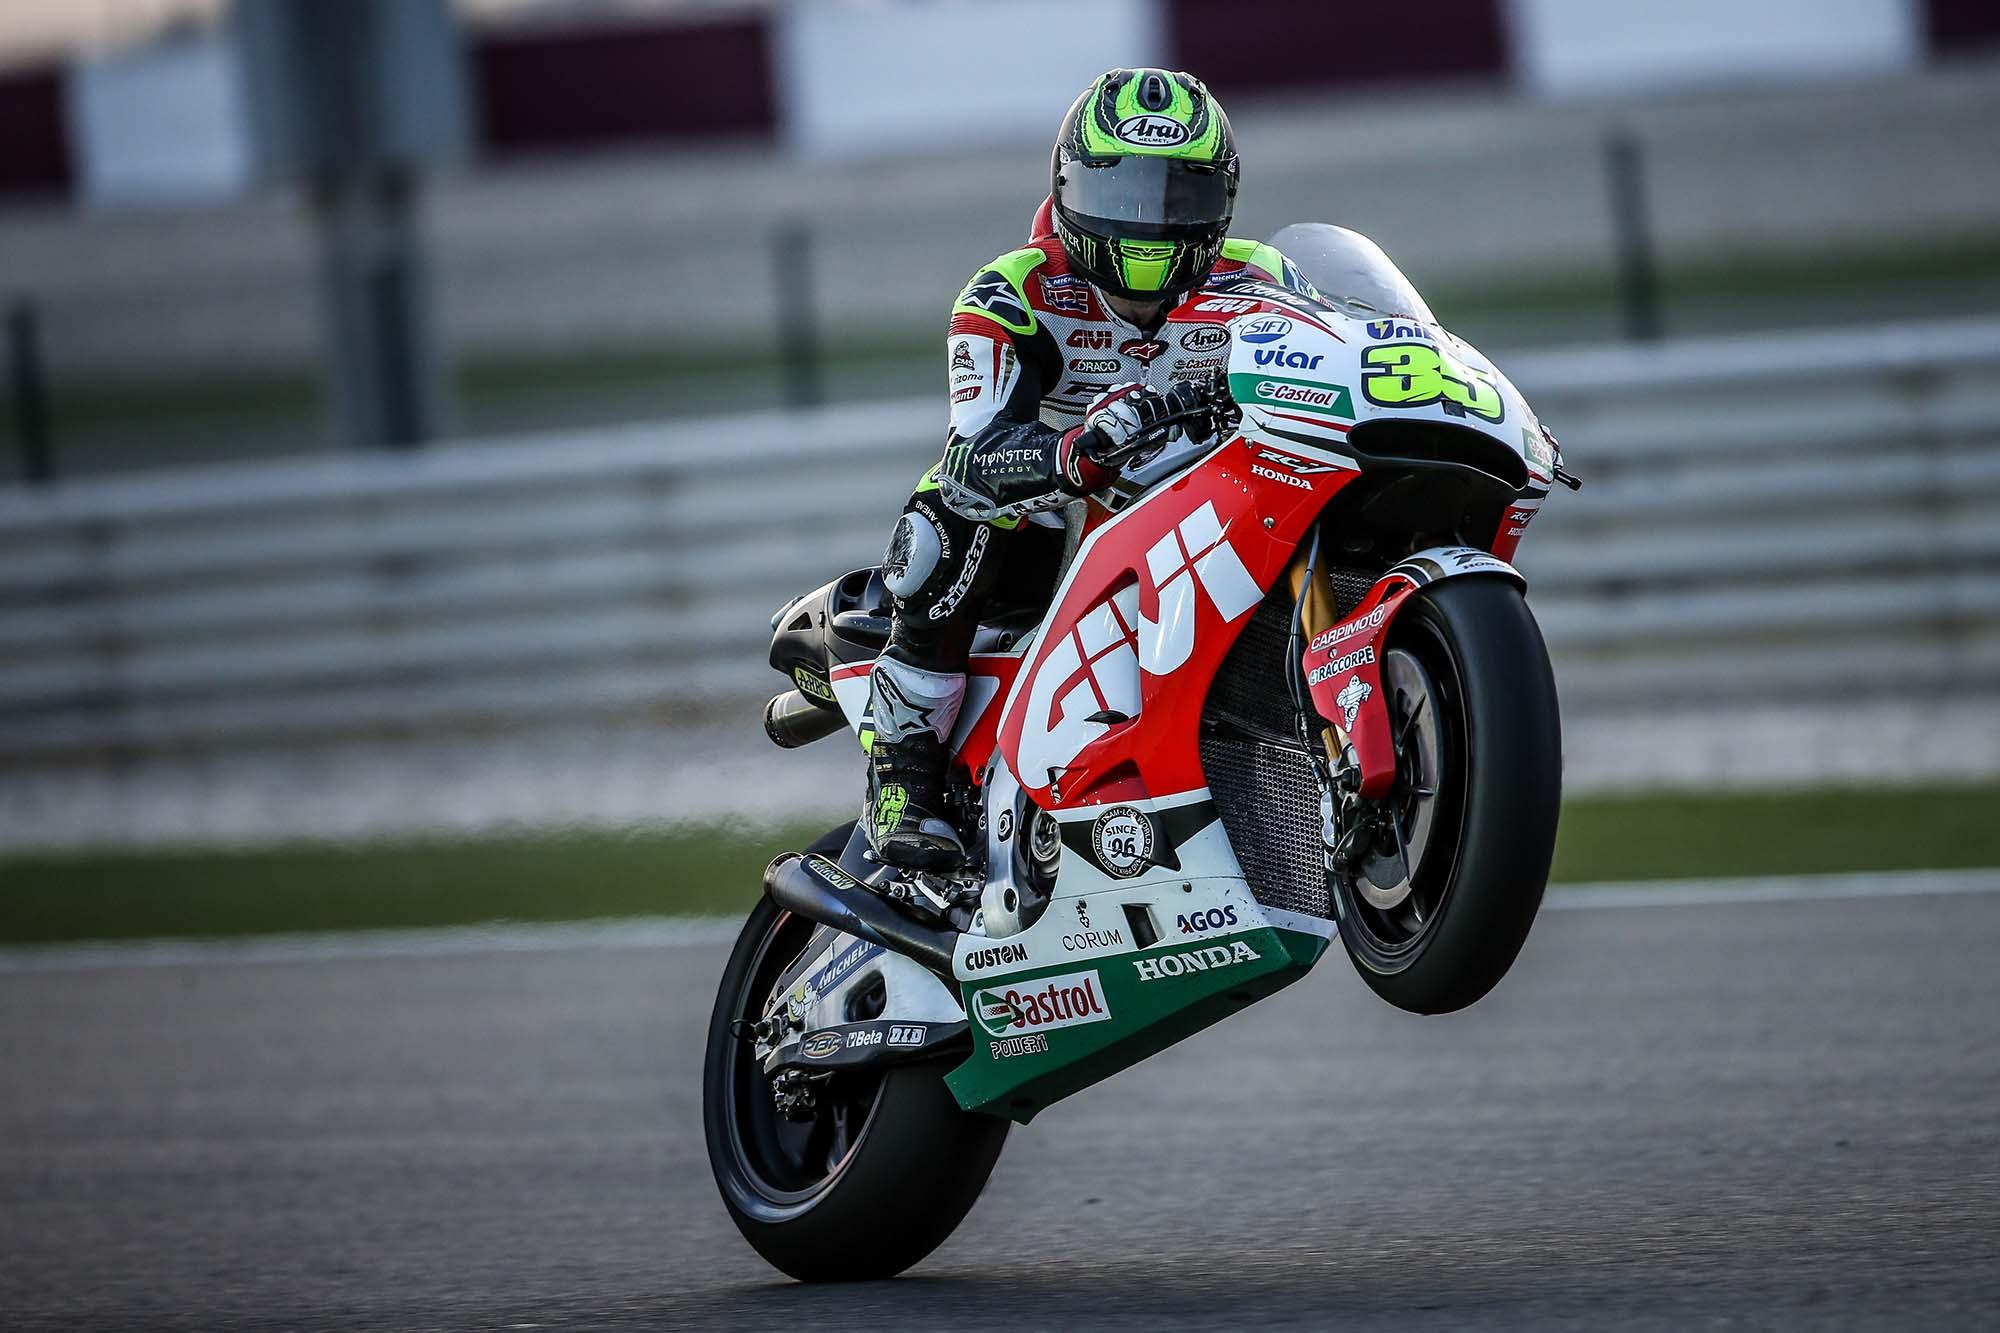 LCR Honda in the Running for Final 2017 MotoGP Grid Slot